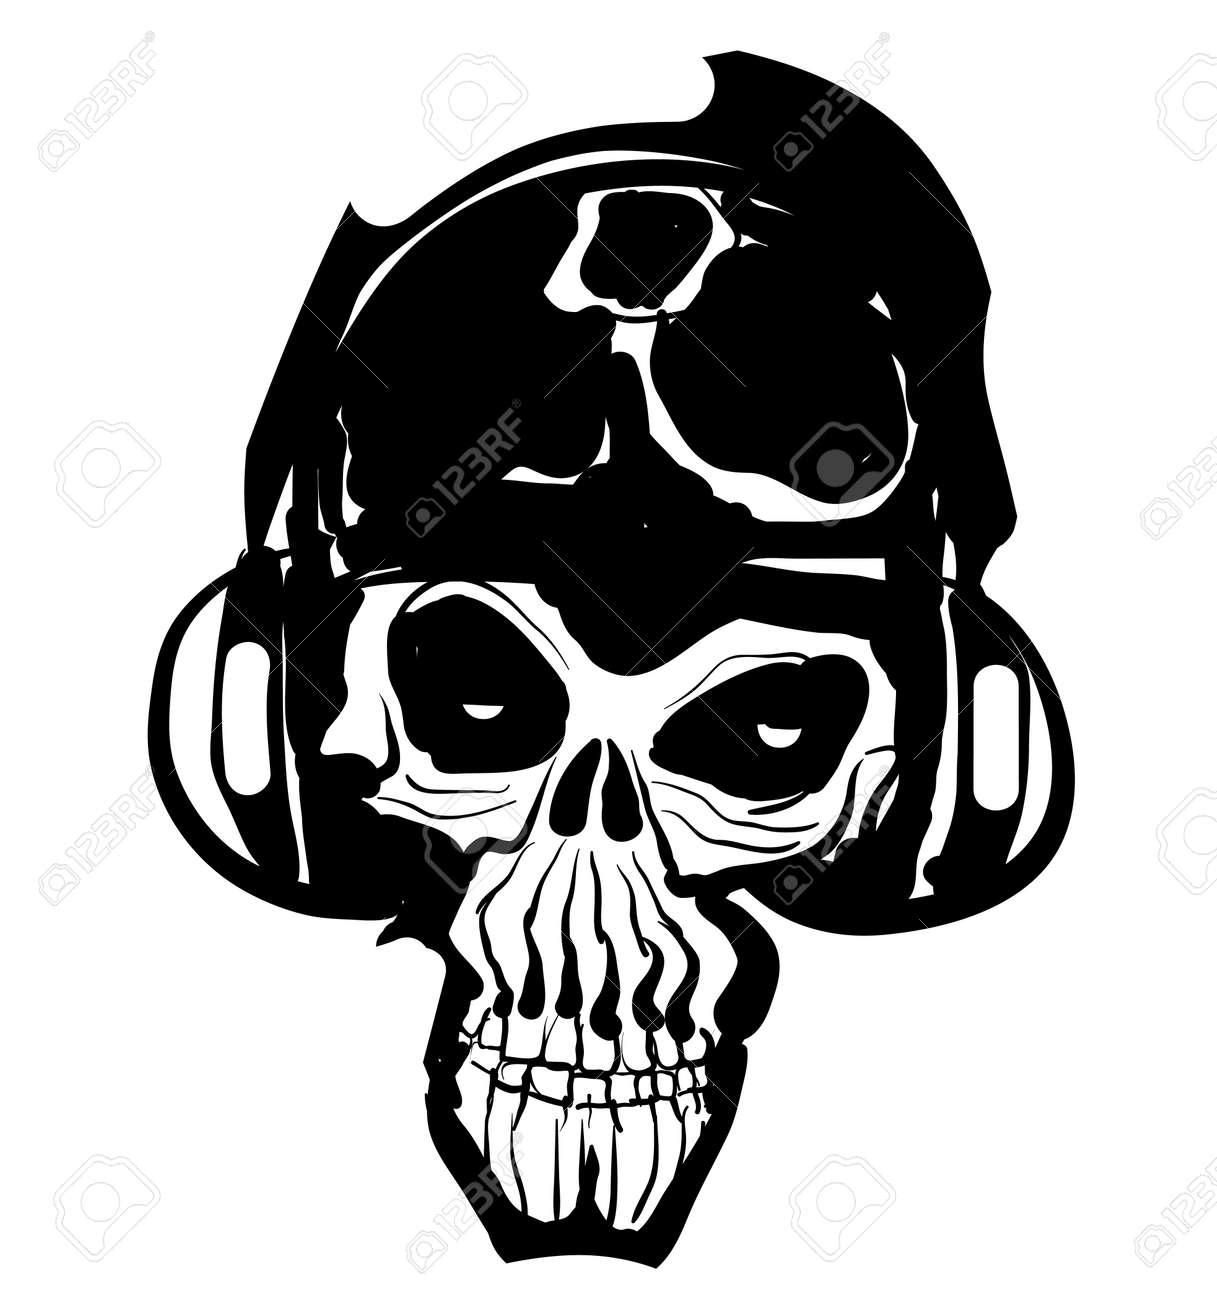 Music Skull Icon Stock Vector - 11950646